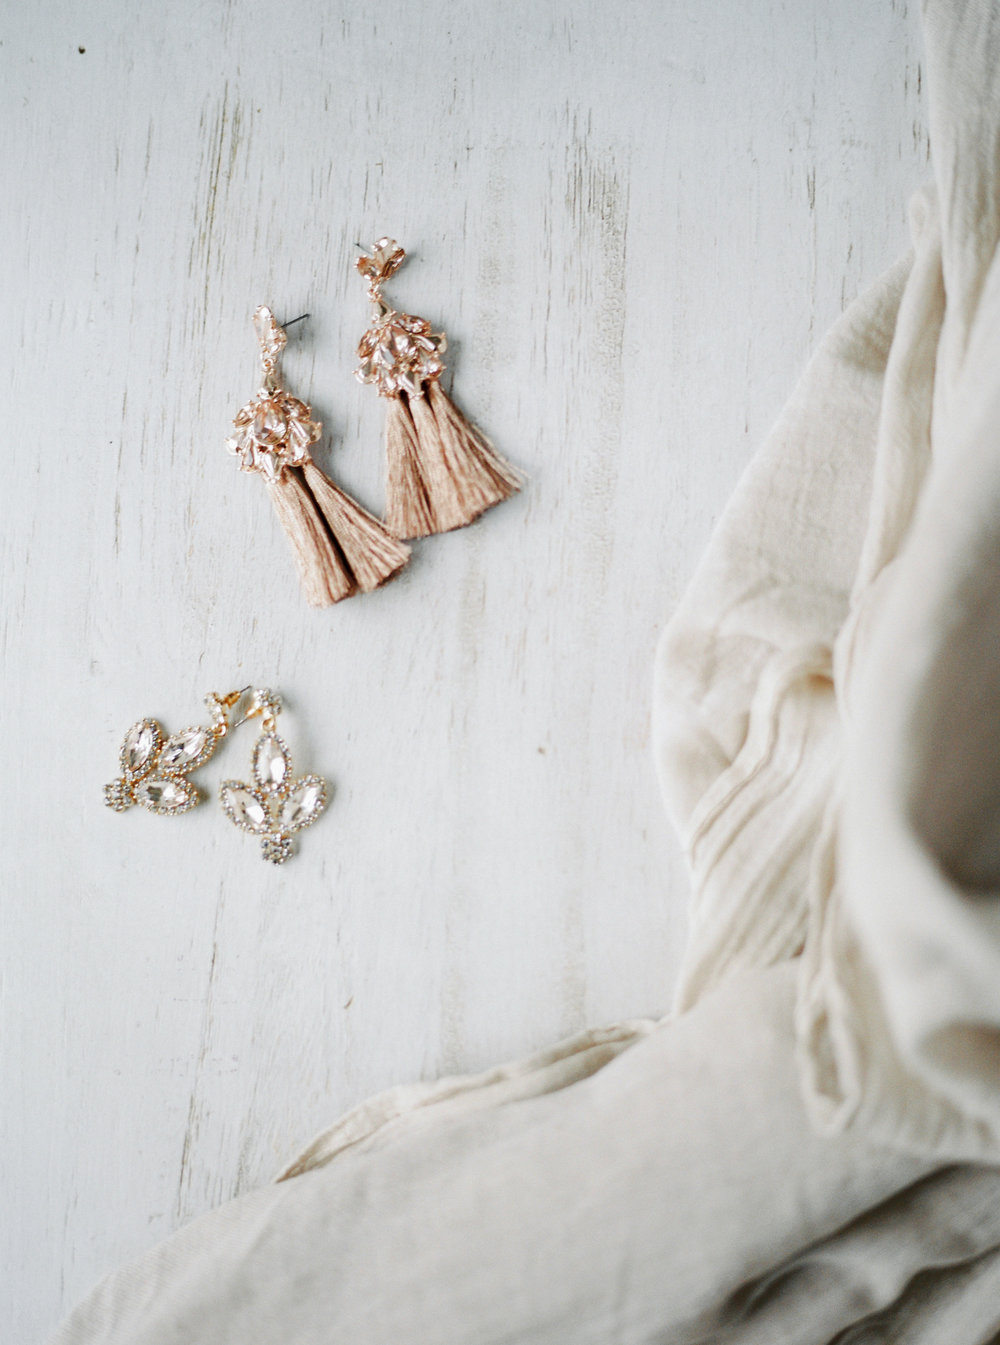 Luxury Wedding Planner UK | Our Chic & Romantic Engagement Shoot in Bath | Katie Julia Photography - 41.JPG